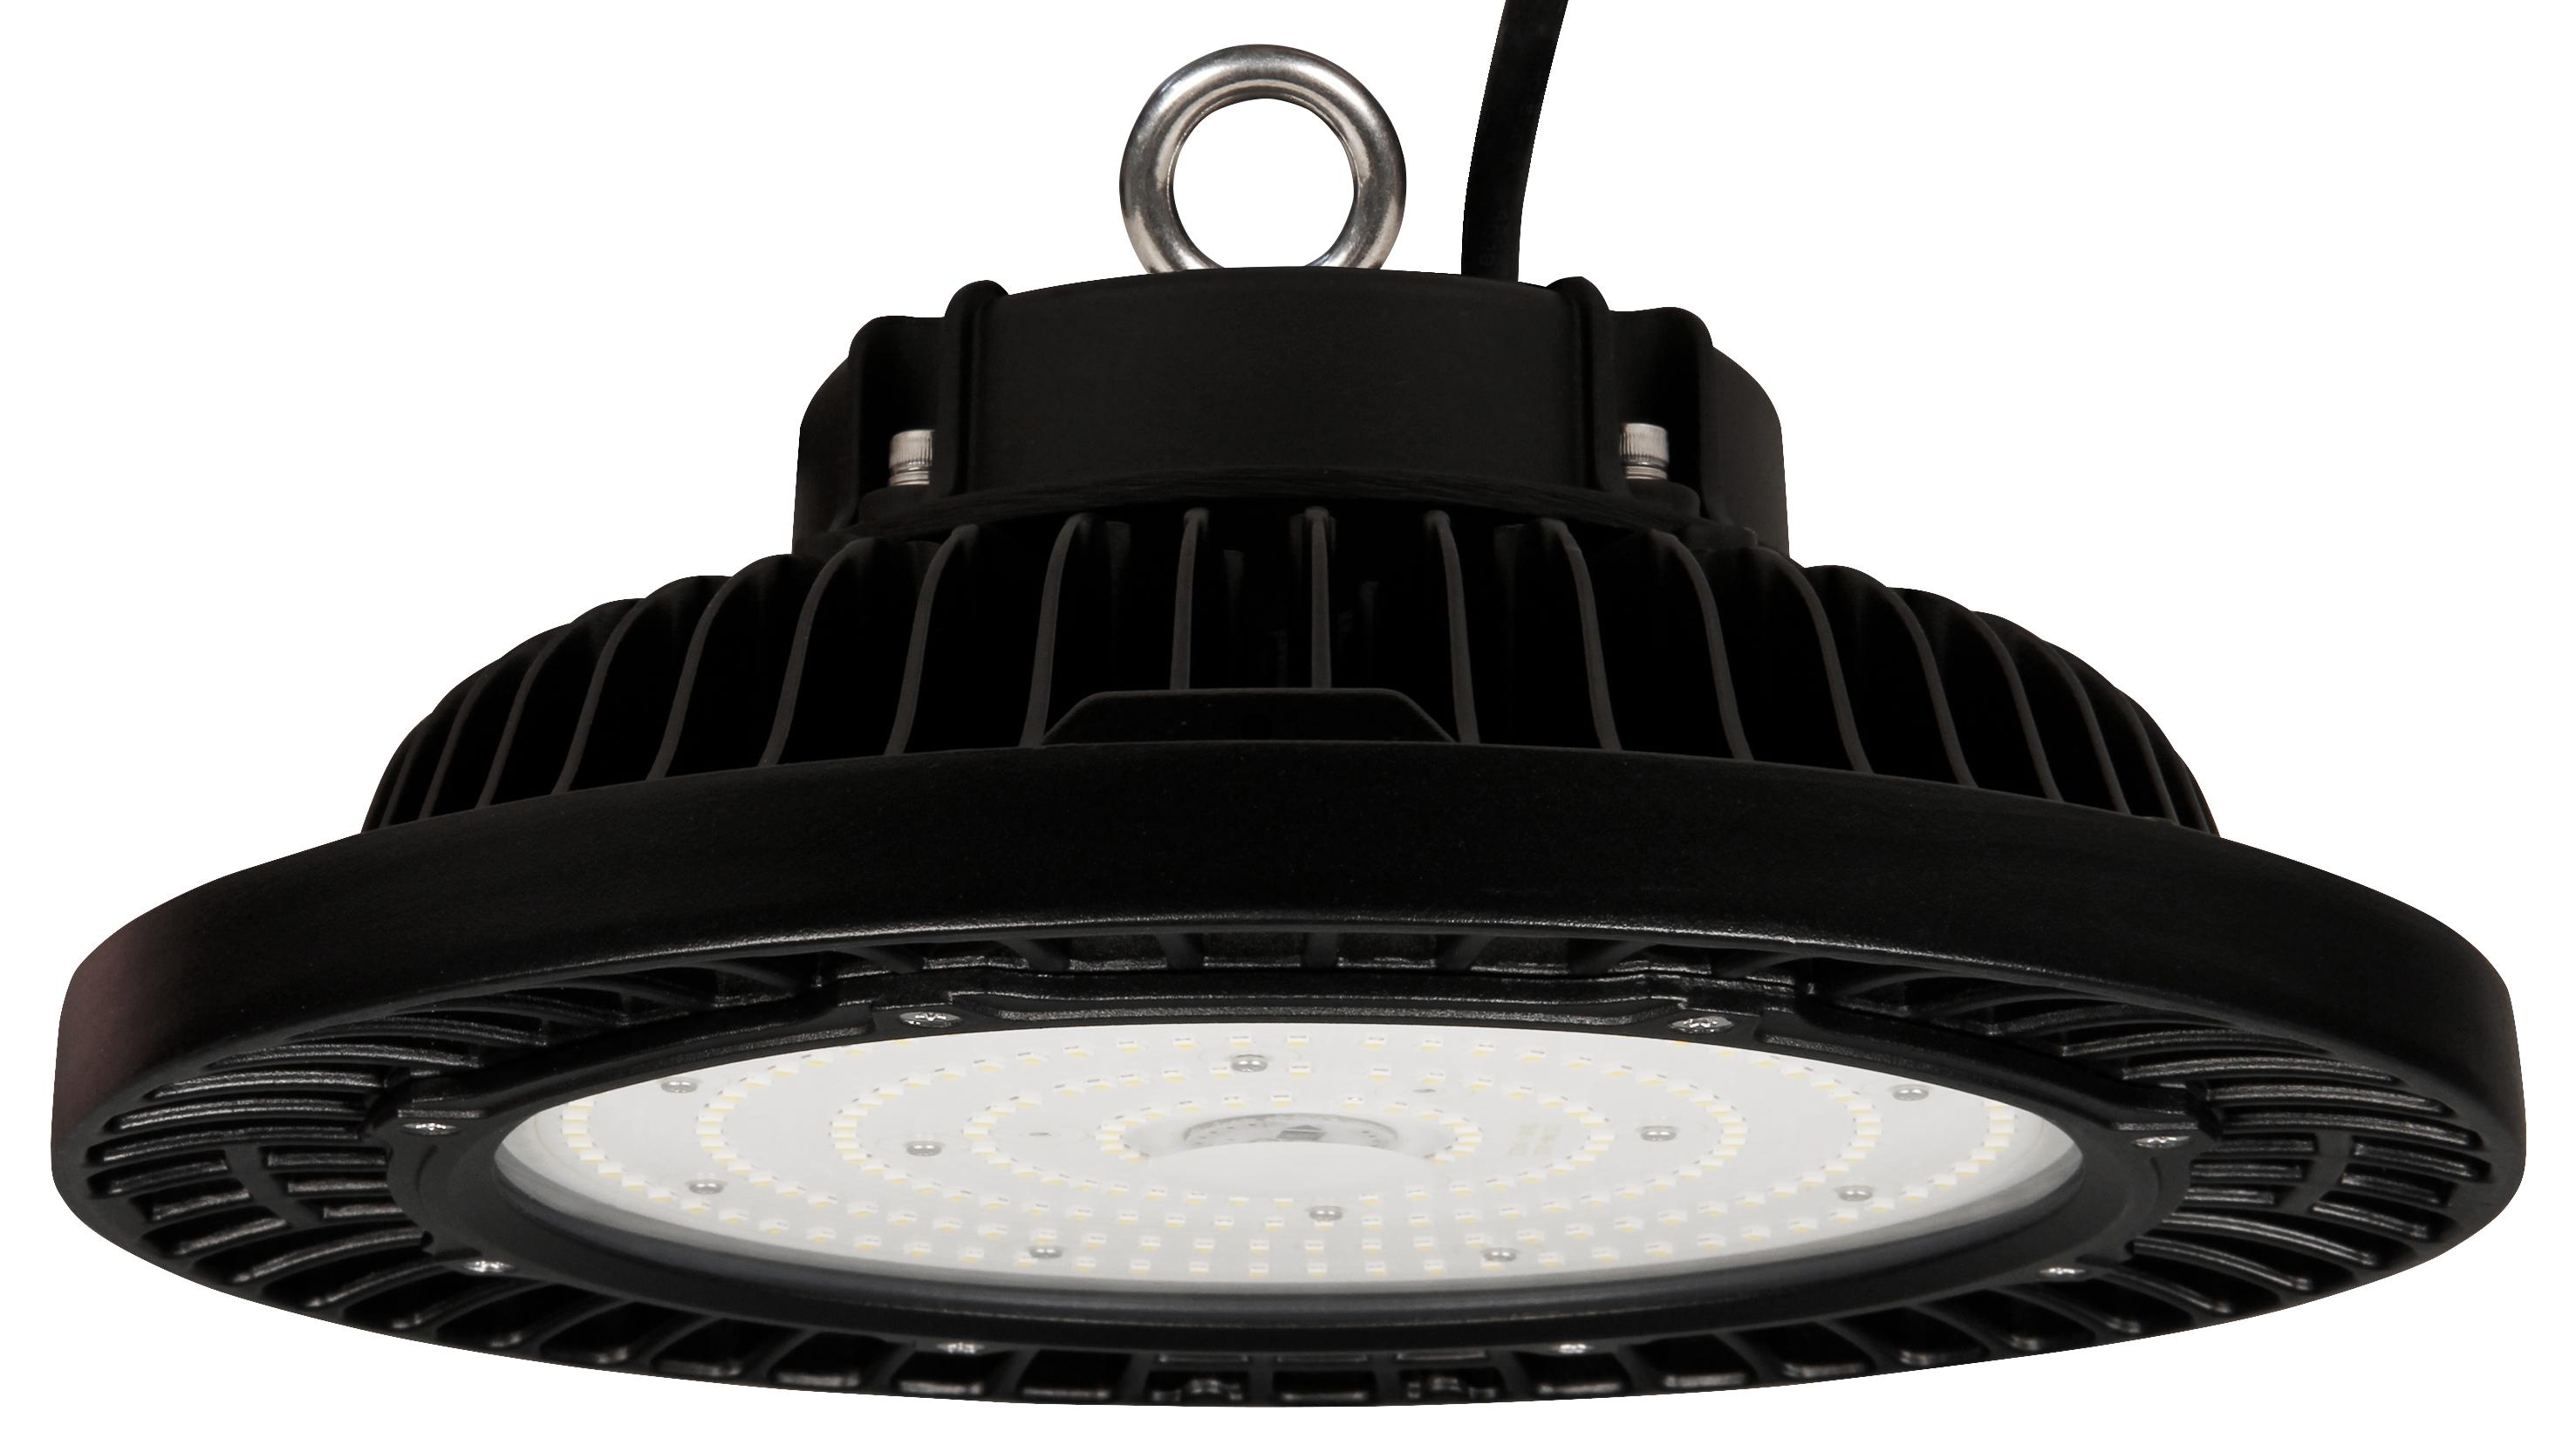 LED-UFO-Hallenstrahler McShine ''UFO-200'' 200W, 28.000lm, 4000K, IP66, 120°